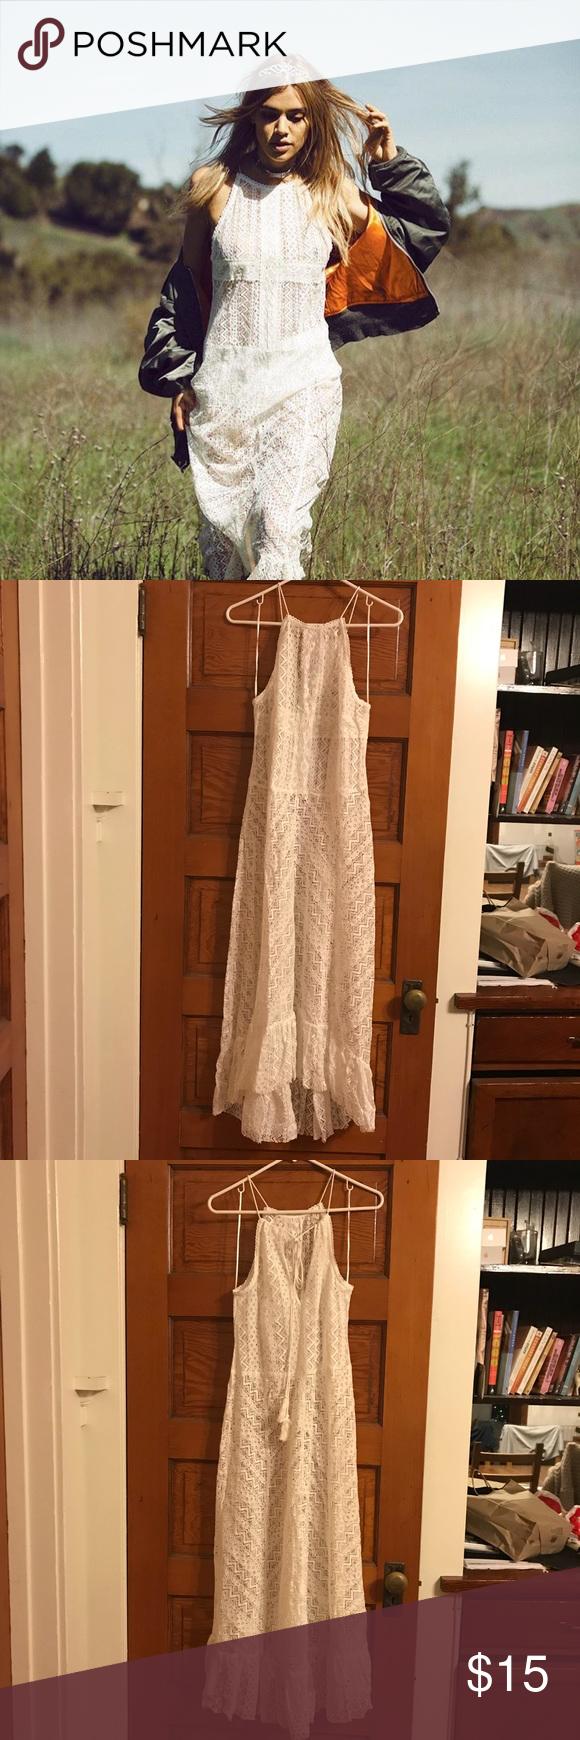 Lace dress cover up  Lace DressCoverup